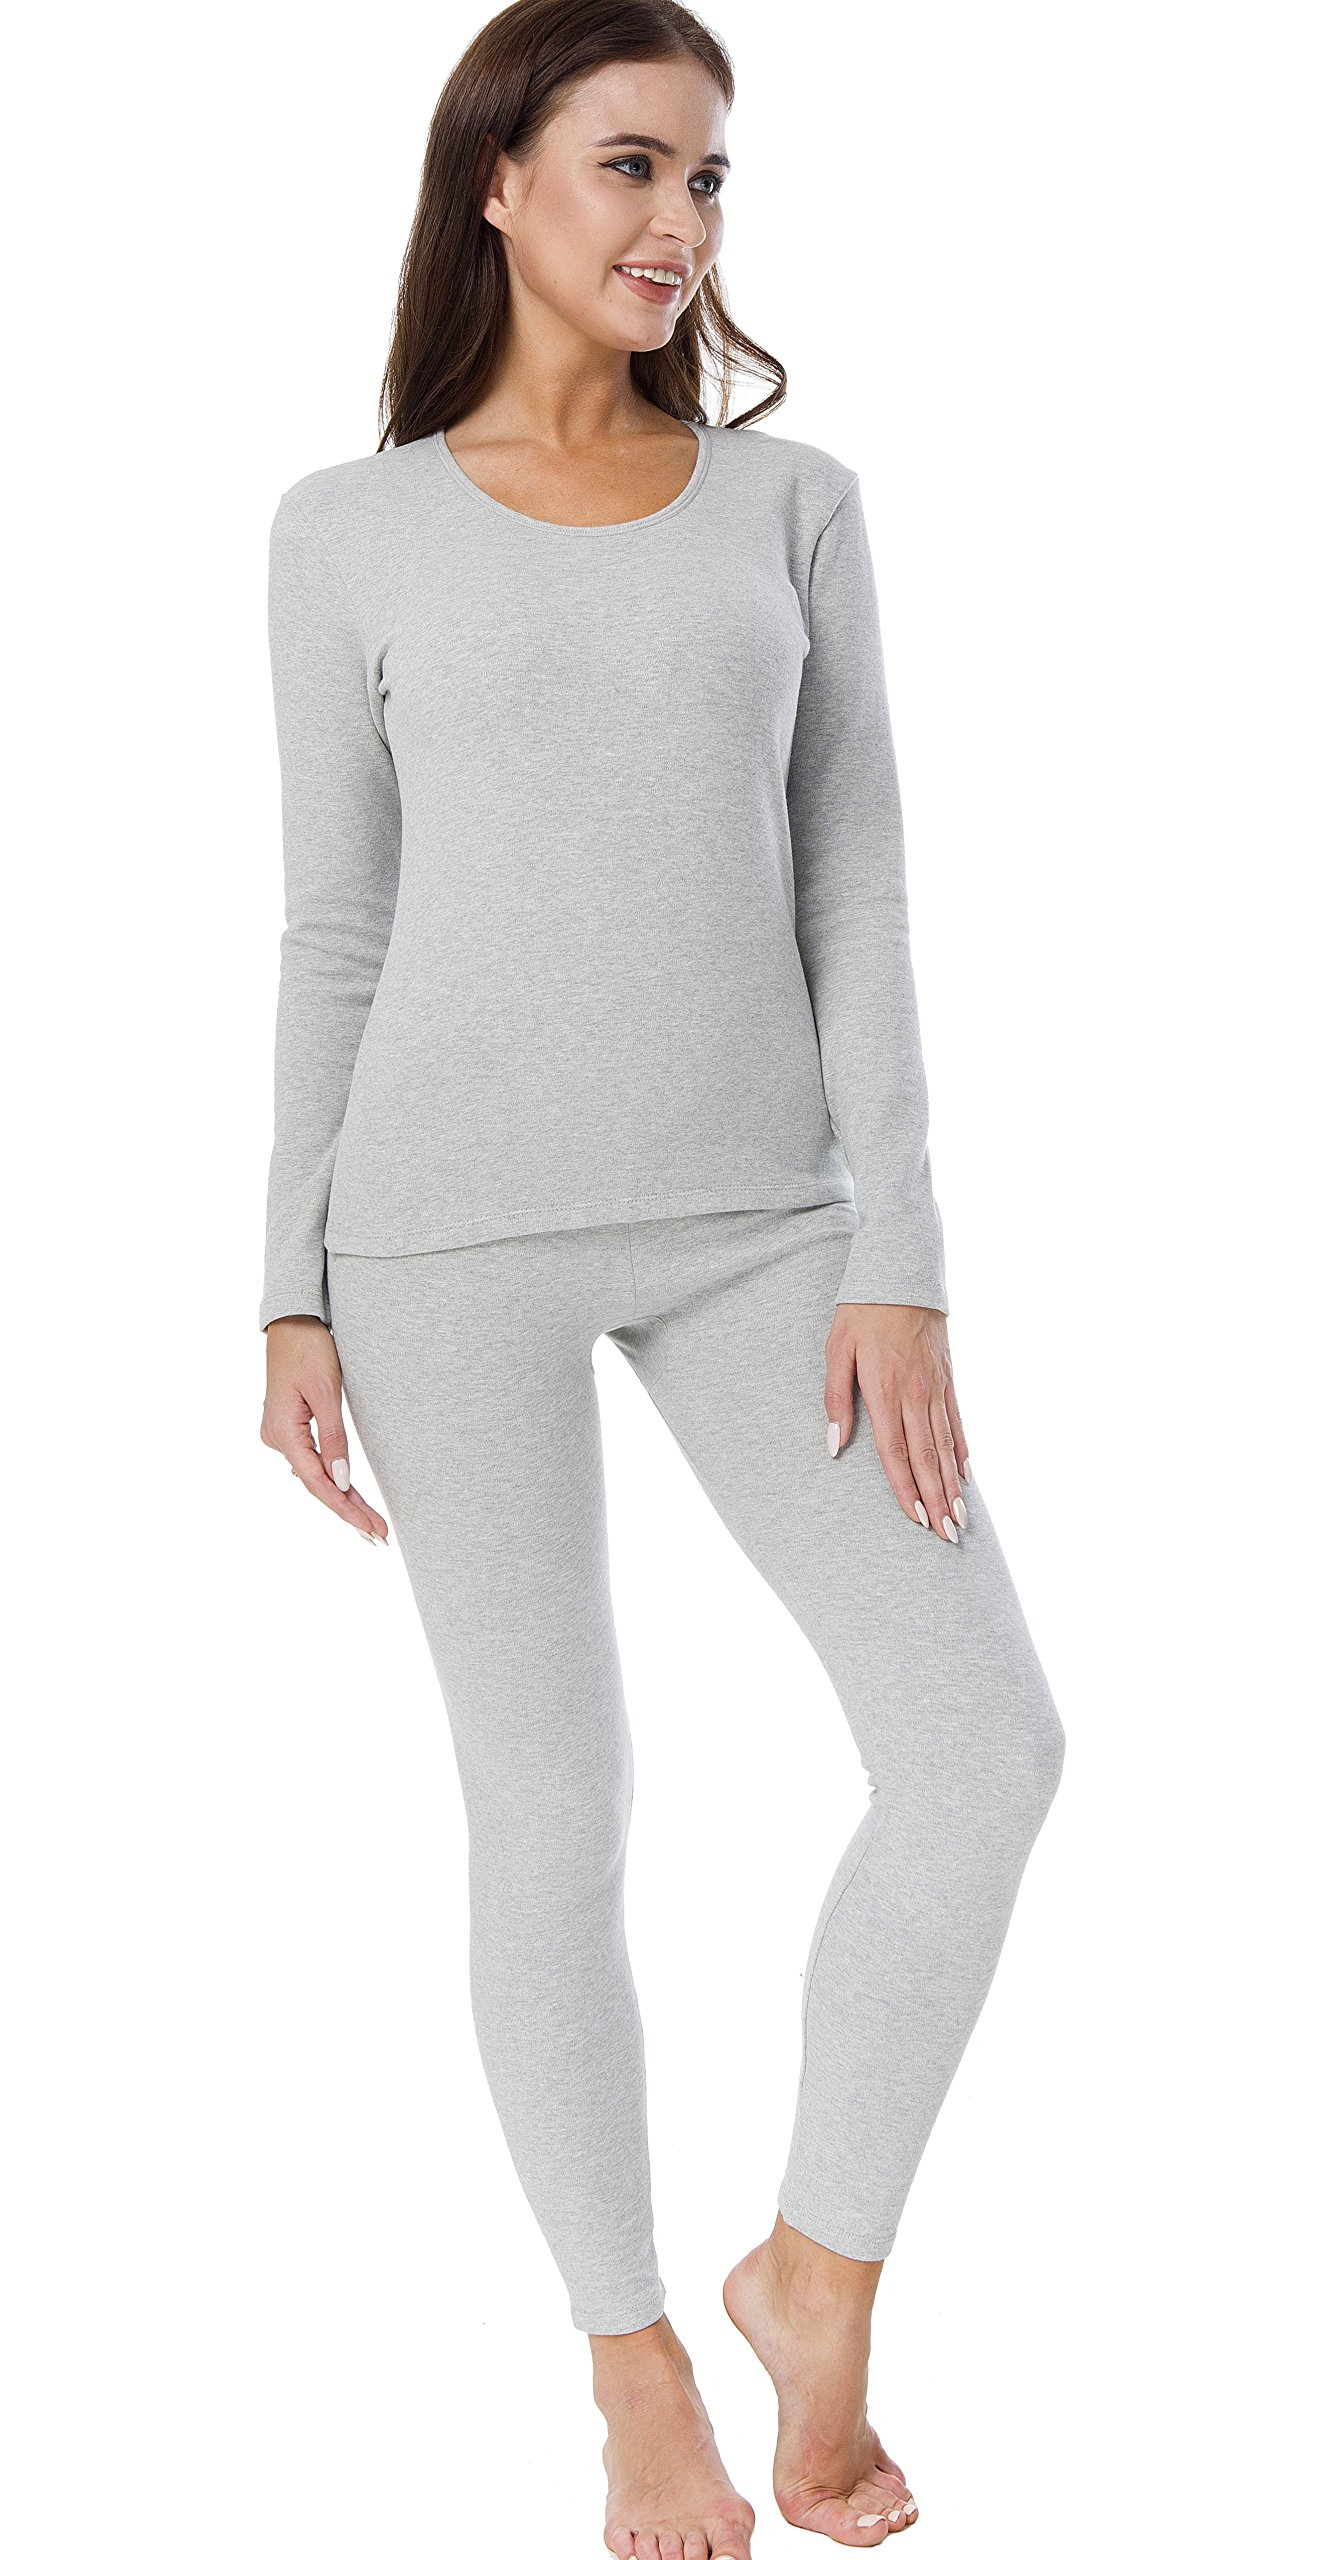 HieasyFit Women's Cotton Thermal Underwear Fleece Lined Winter Base Layer Set Light Gray XL